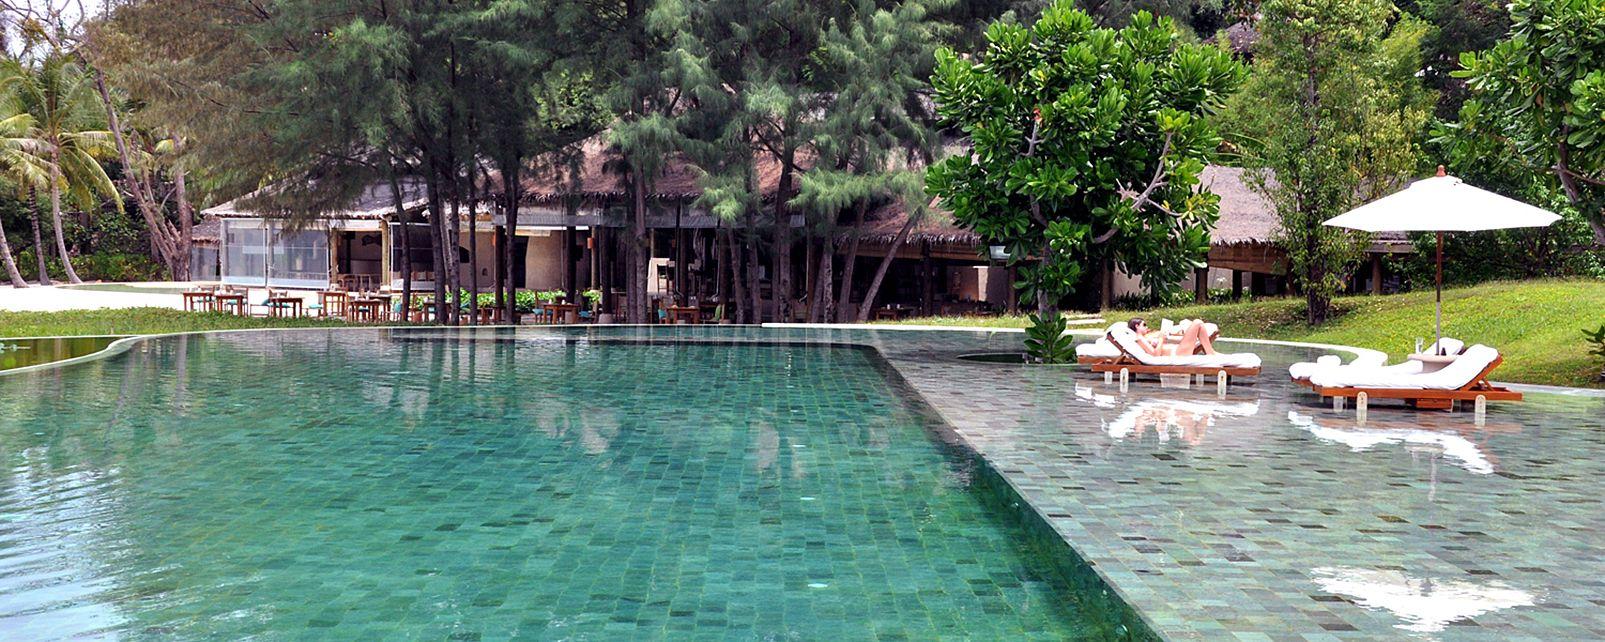 Hôtel Six Senses Sanctuary Phuket